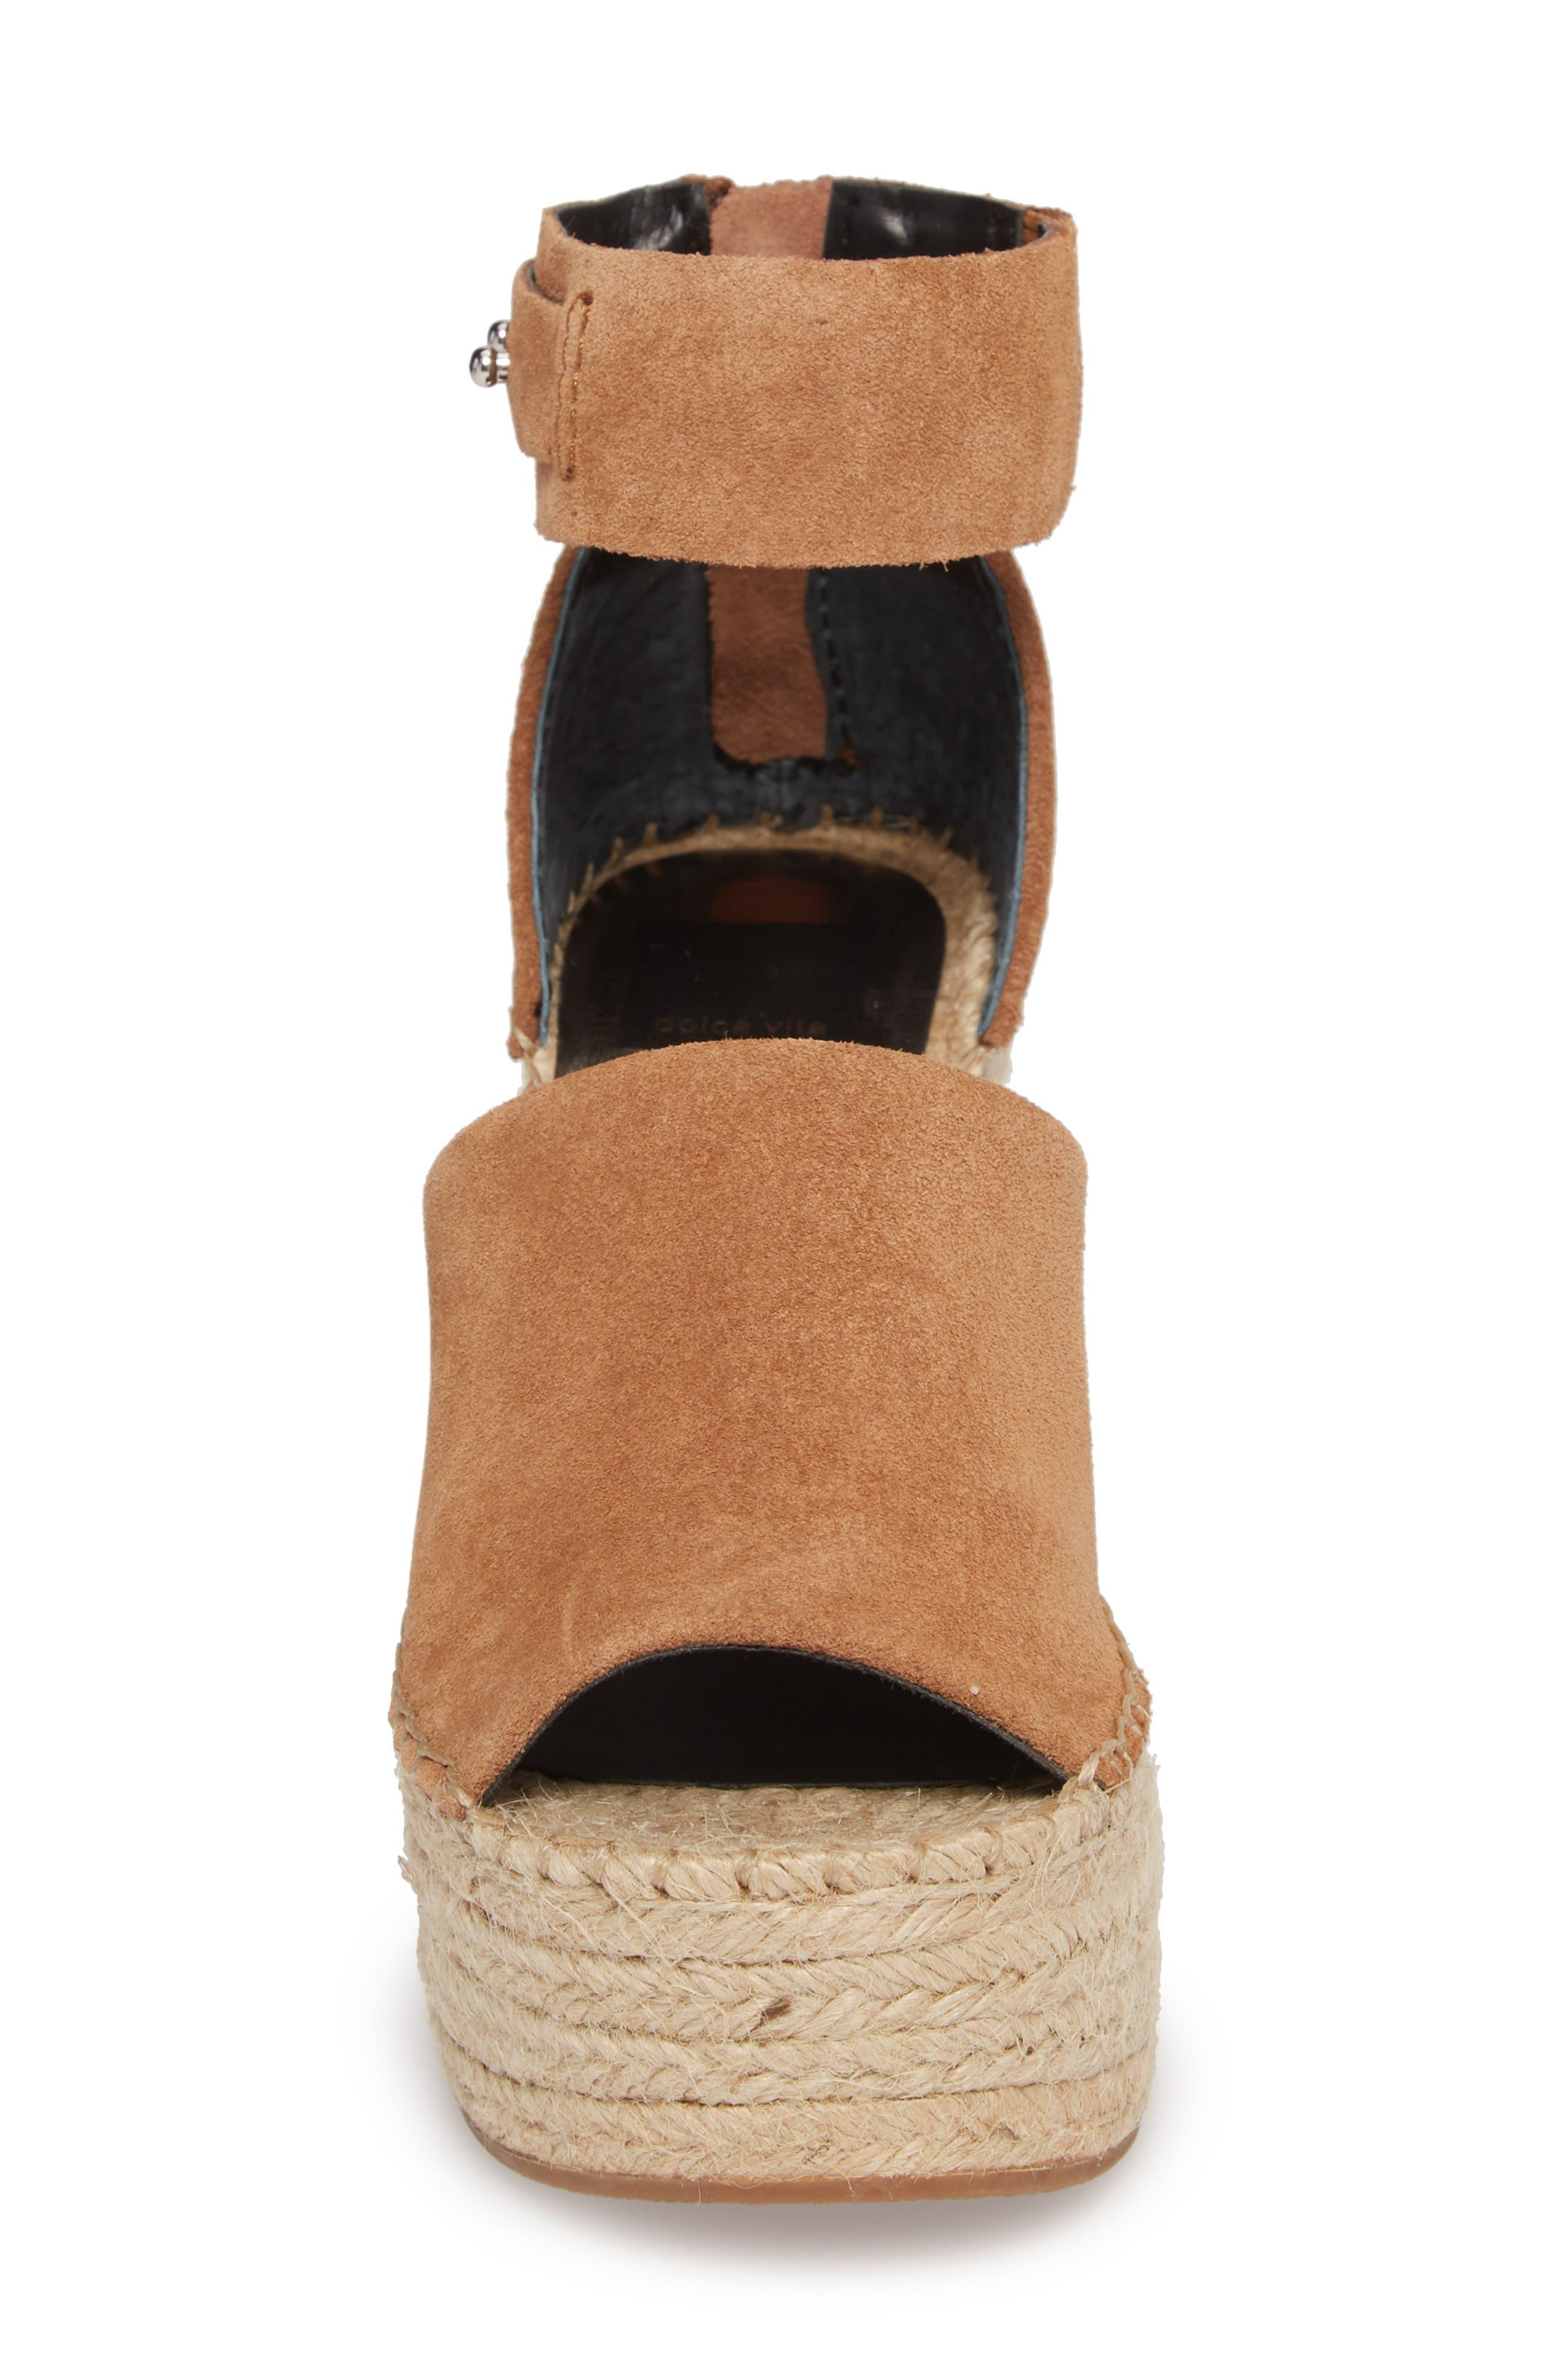 Straw Wedge Espadrille Sandal,                             Alternate thumbnail 4, color,                             Dark Saddle